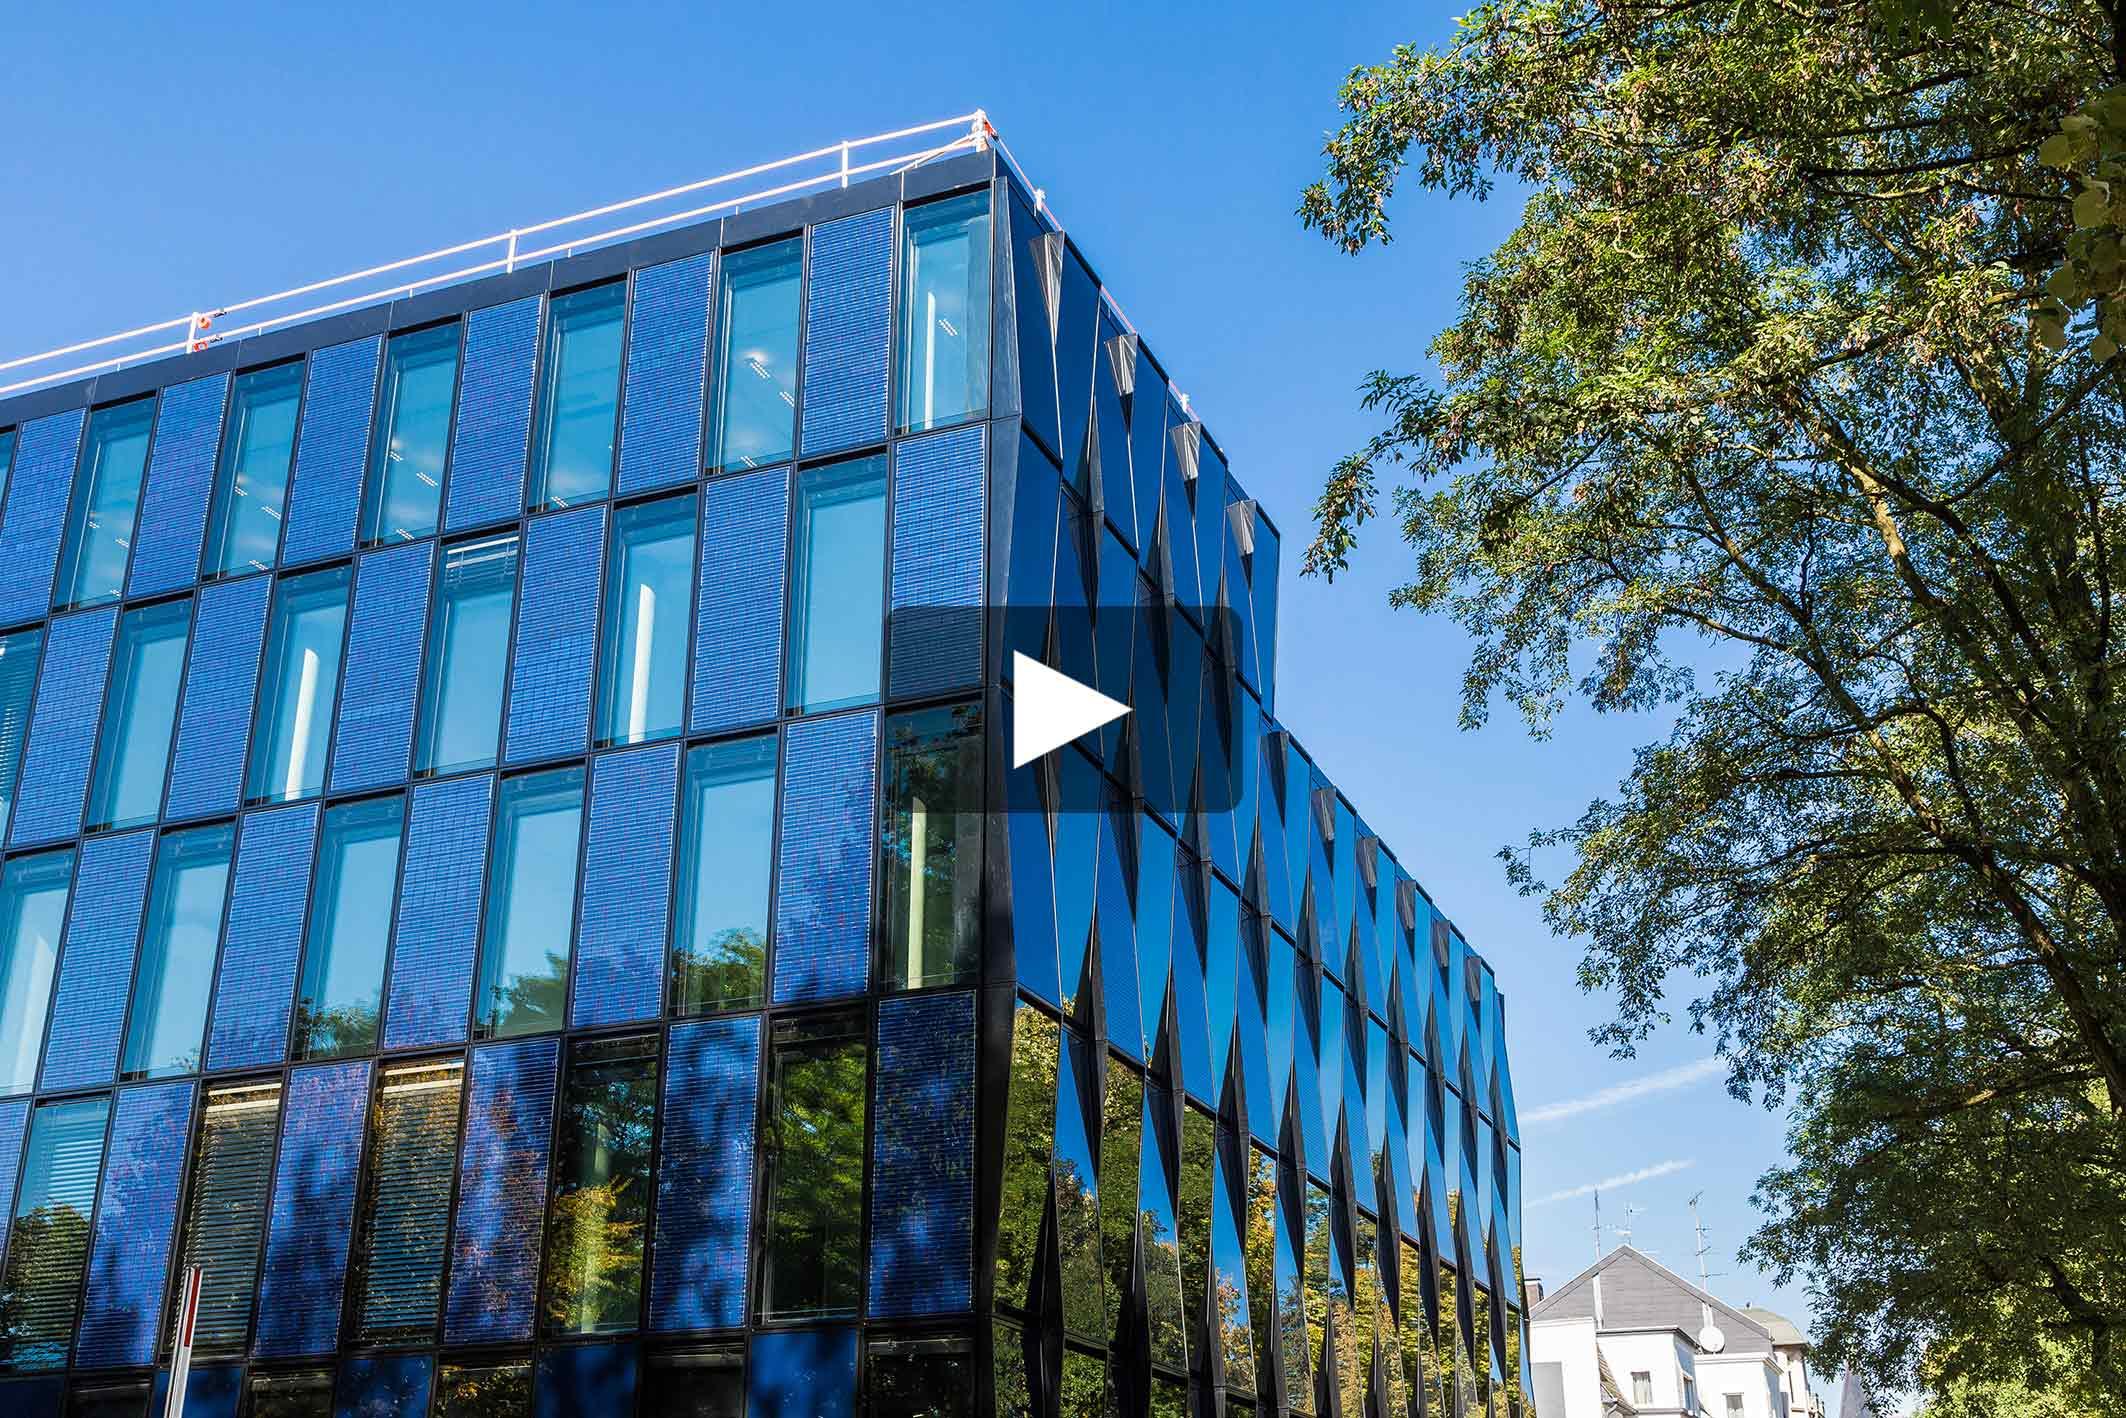 Blauhaus Video